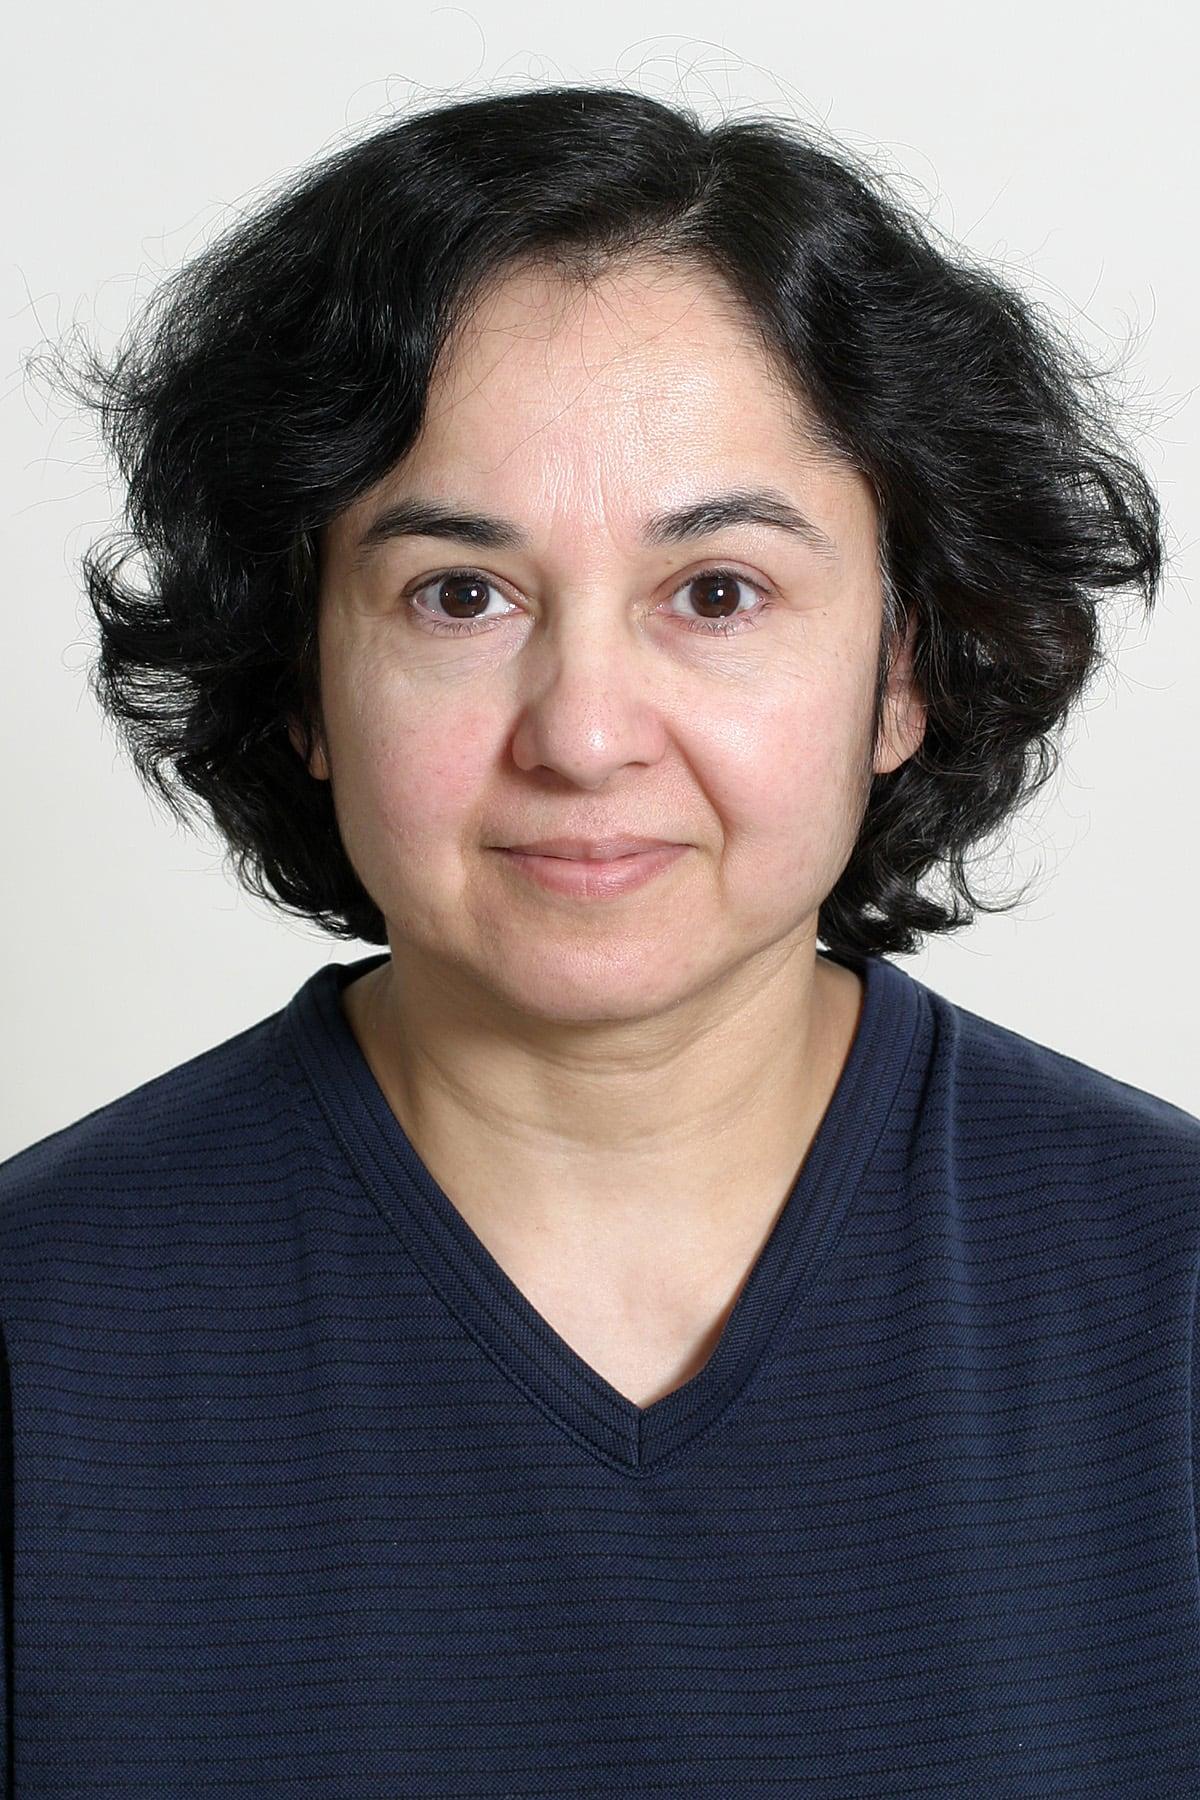 Dr. Naz J Zulqarni MD